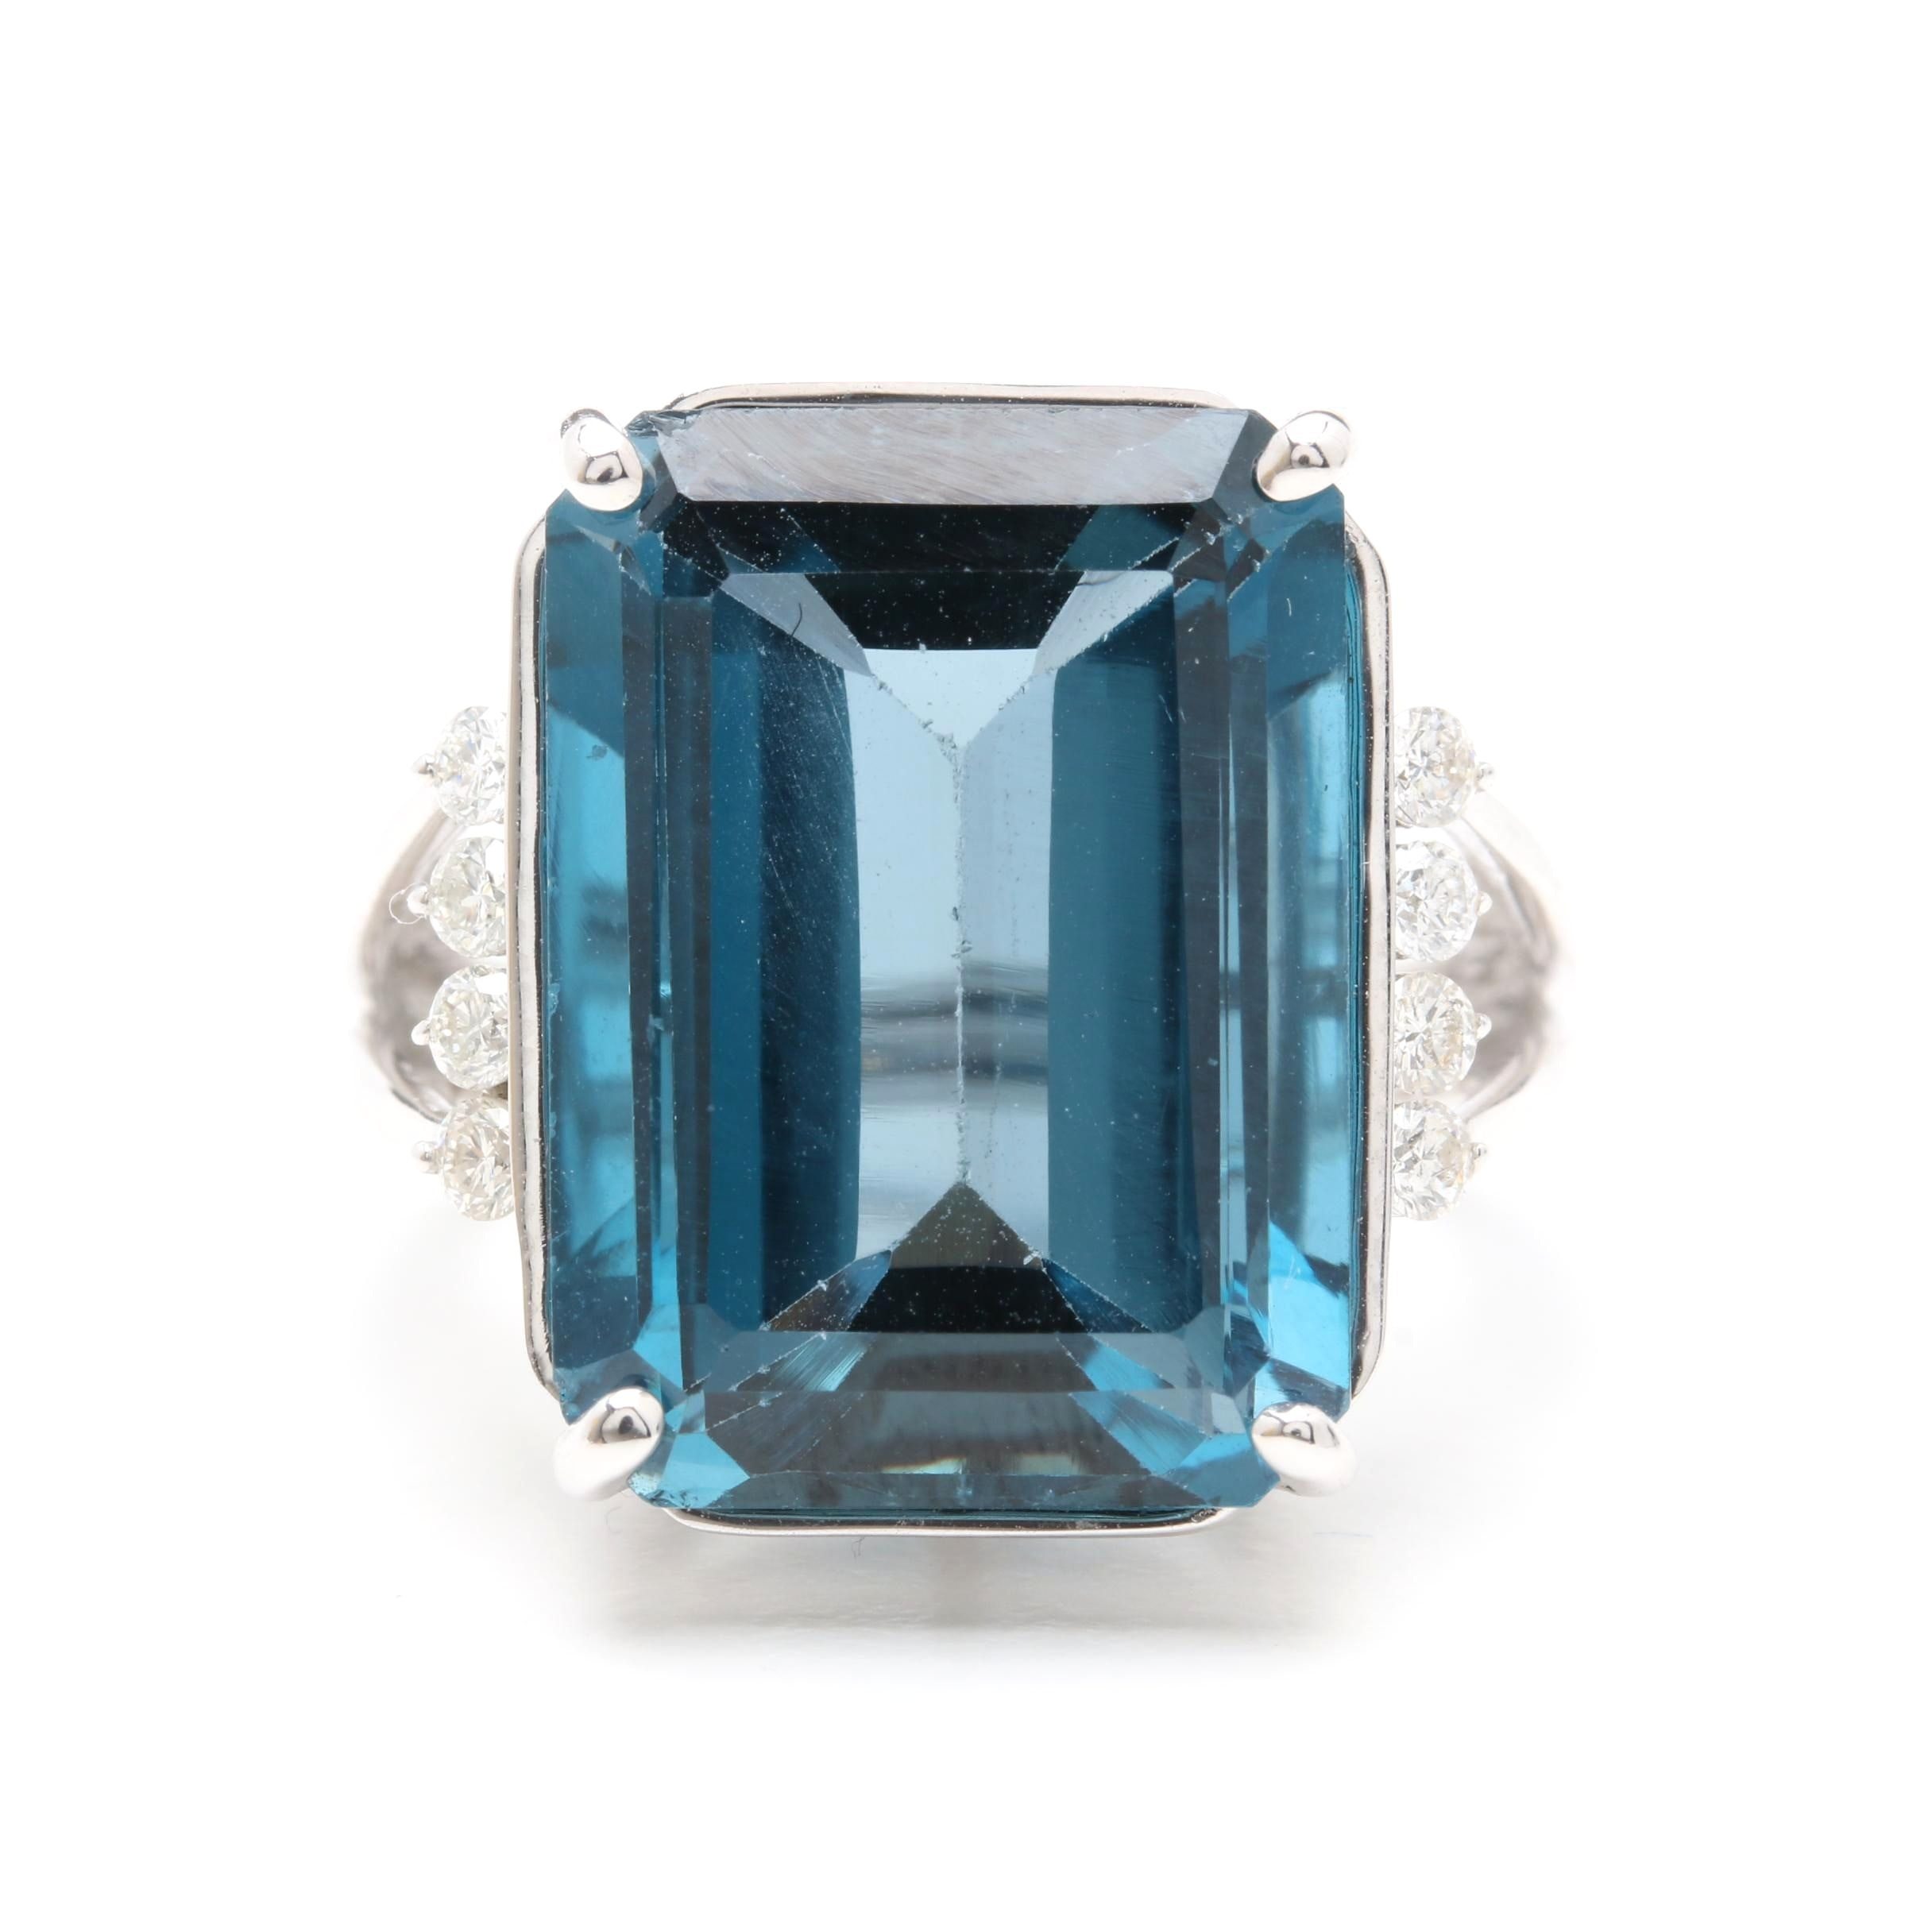 14K White Gold 19.38 CT Blue Topaz and Diamond Ring